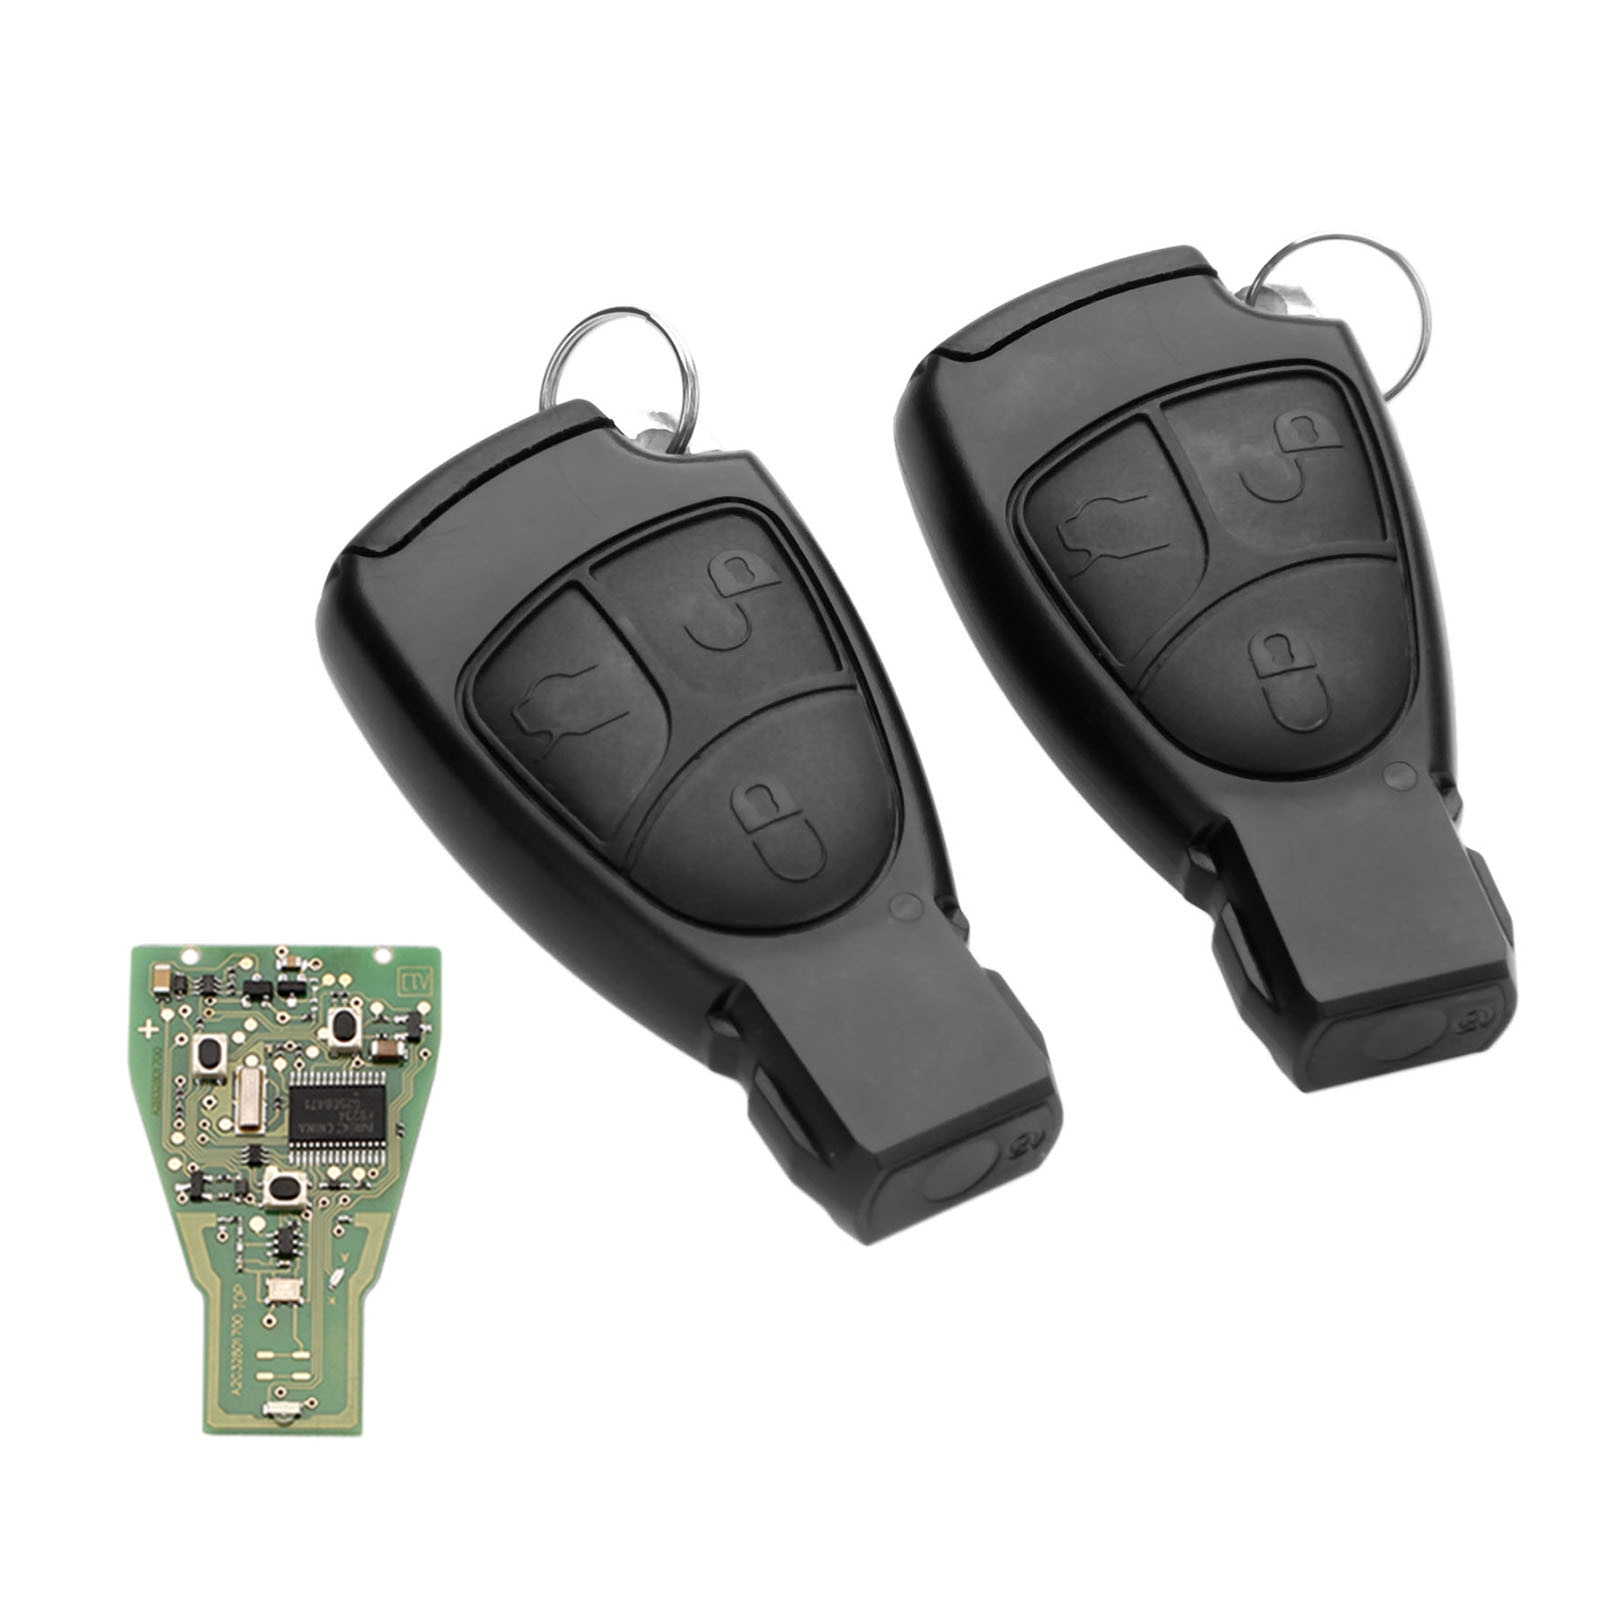 Yetaha 2PCS Fernbedienung Smart Key Mit 7941 Chip Für Mercedes Benz C E S Klasse CLS CLK SLK CL 3 tasten 433,9 MHZ Auto Keyless Remtekey